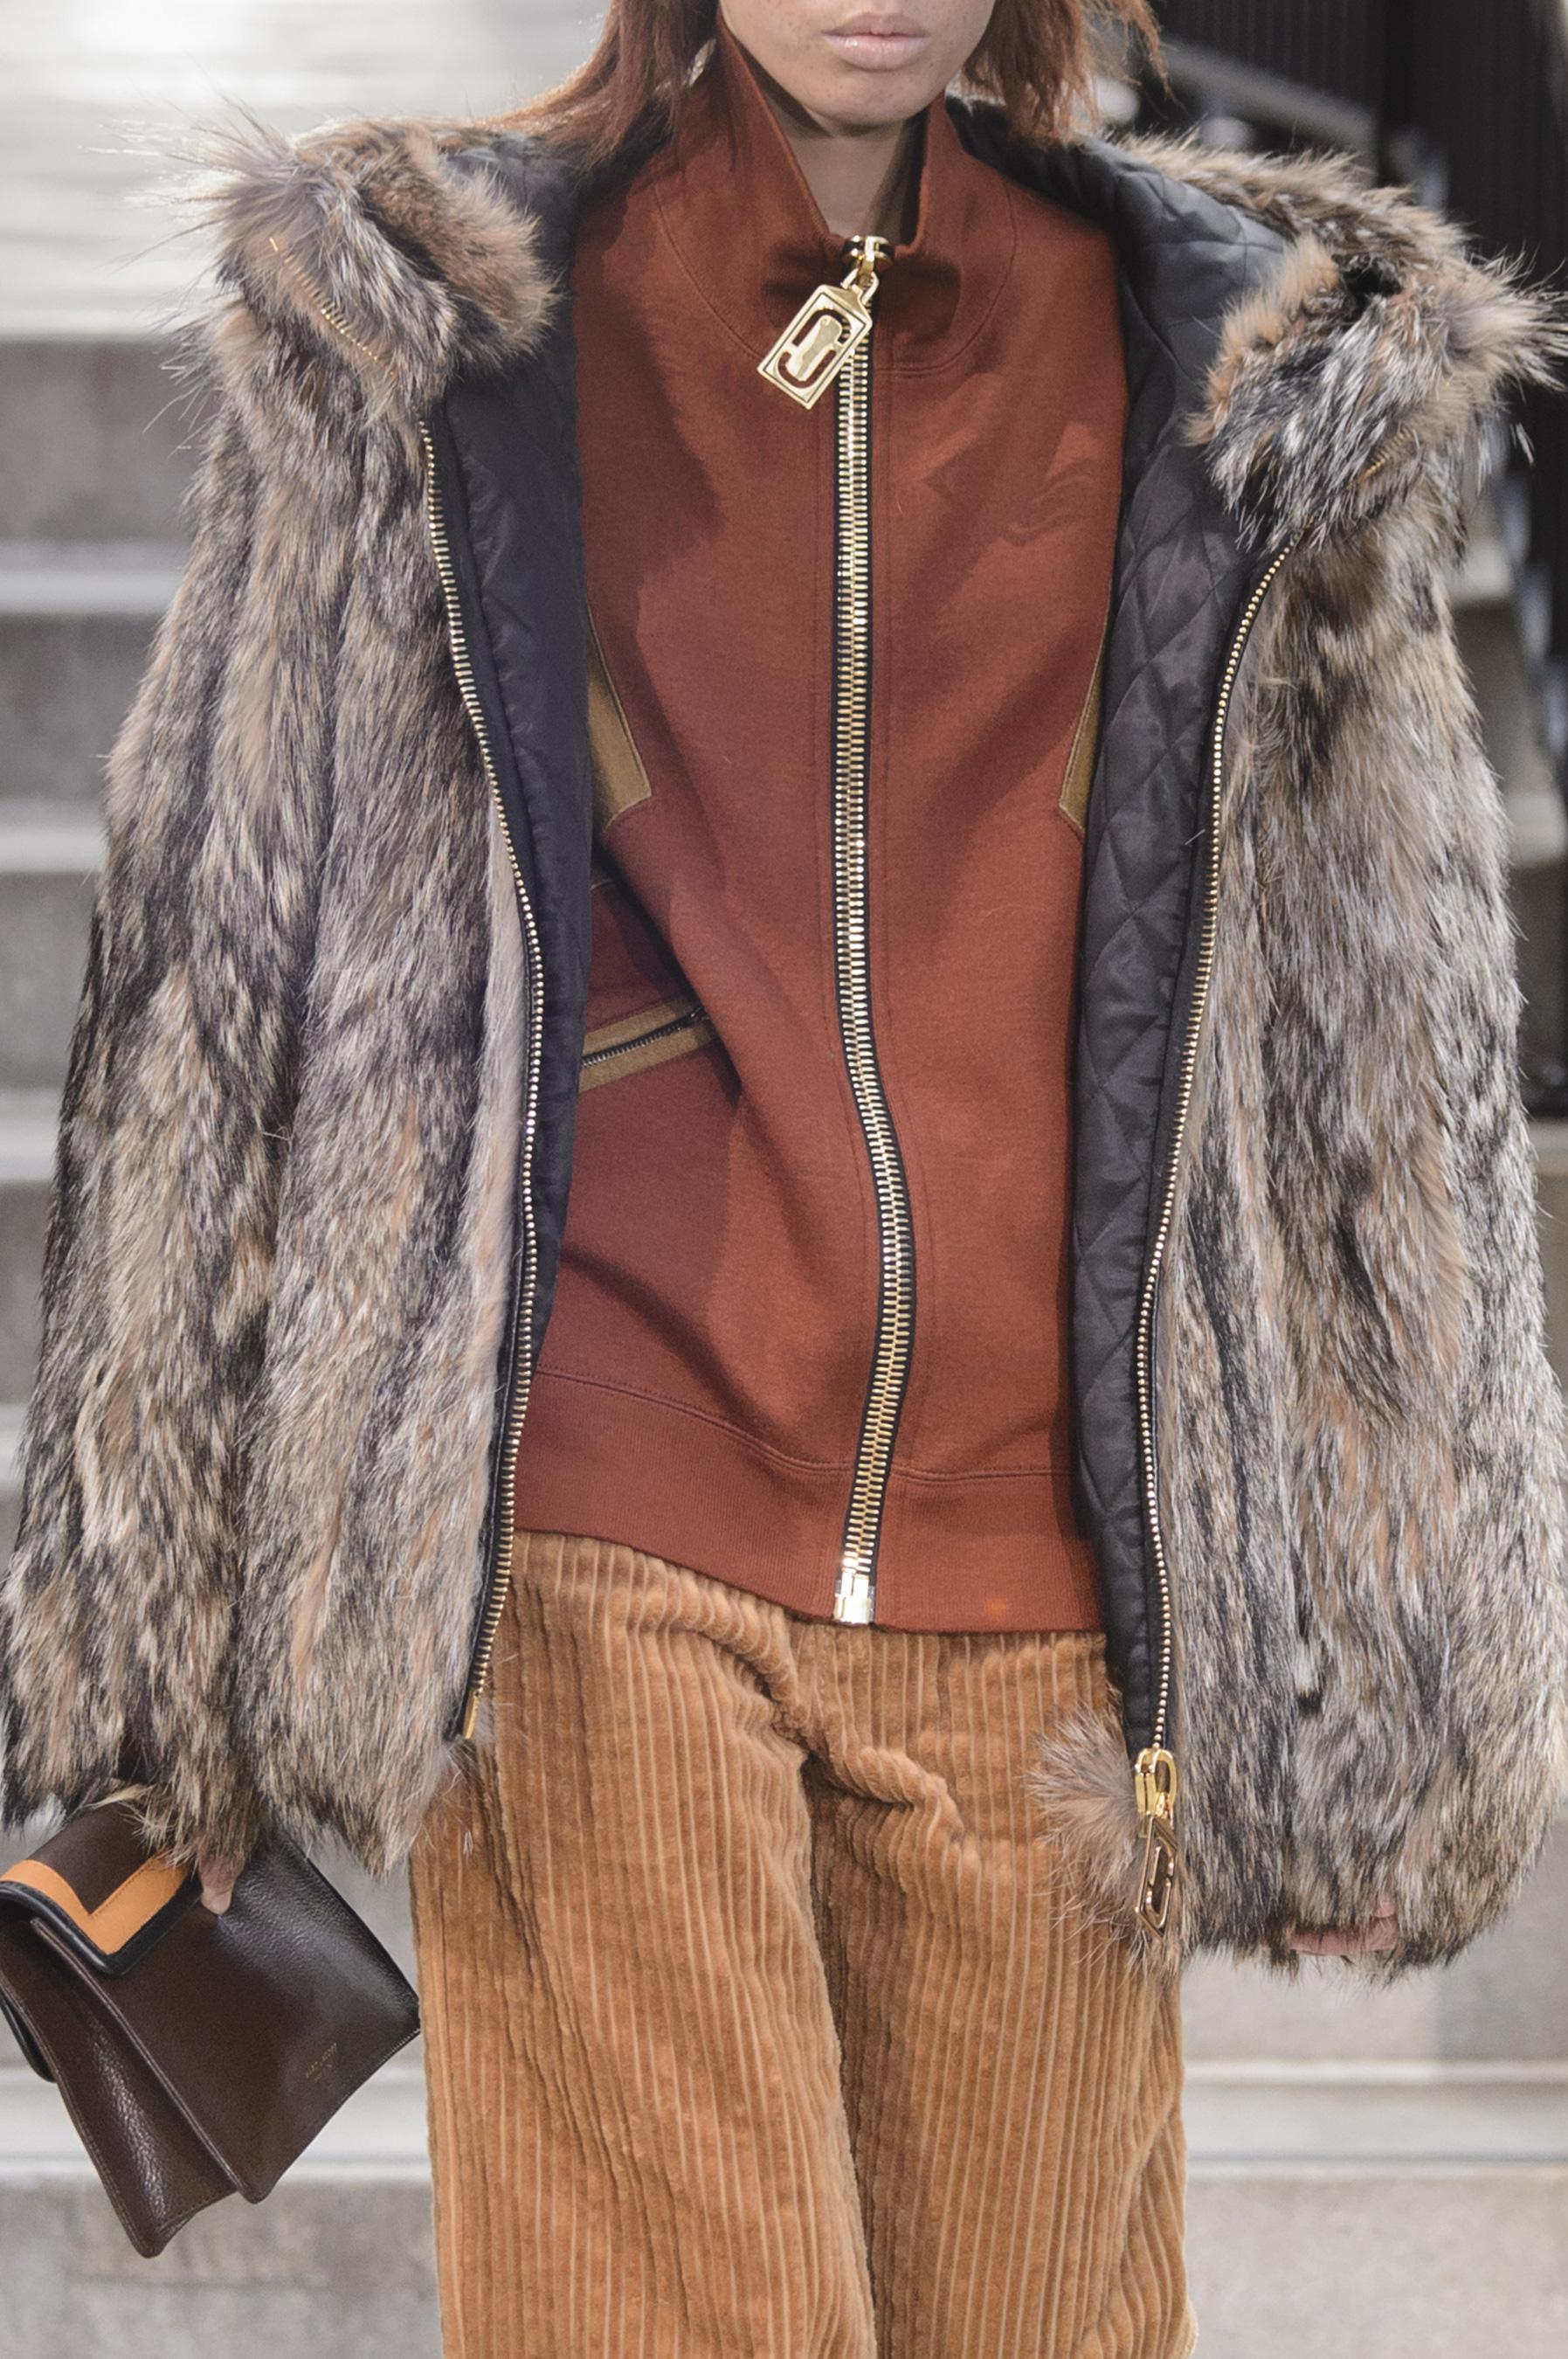 Marc Jacobs clpb RF17 0529